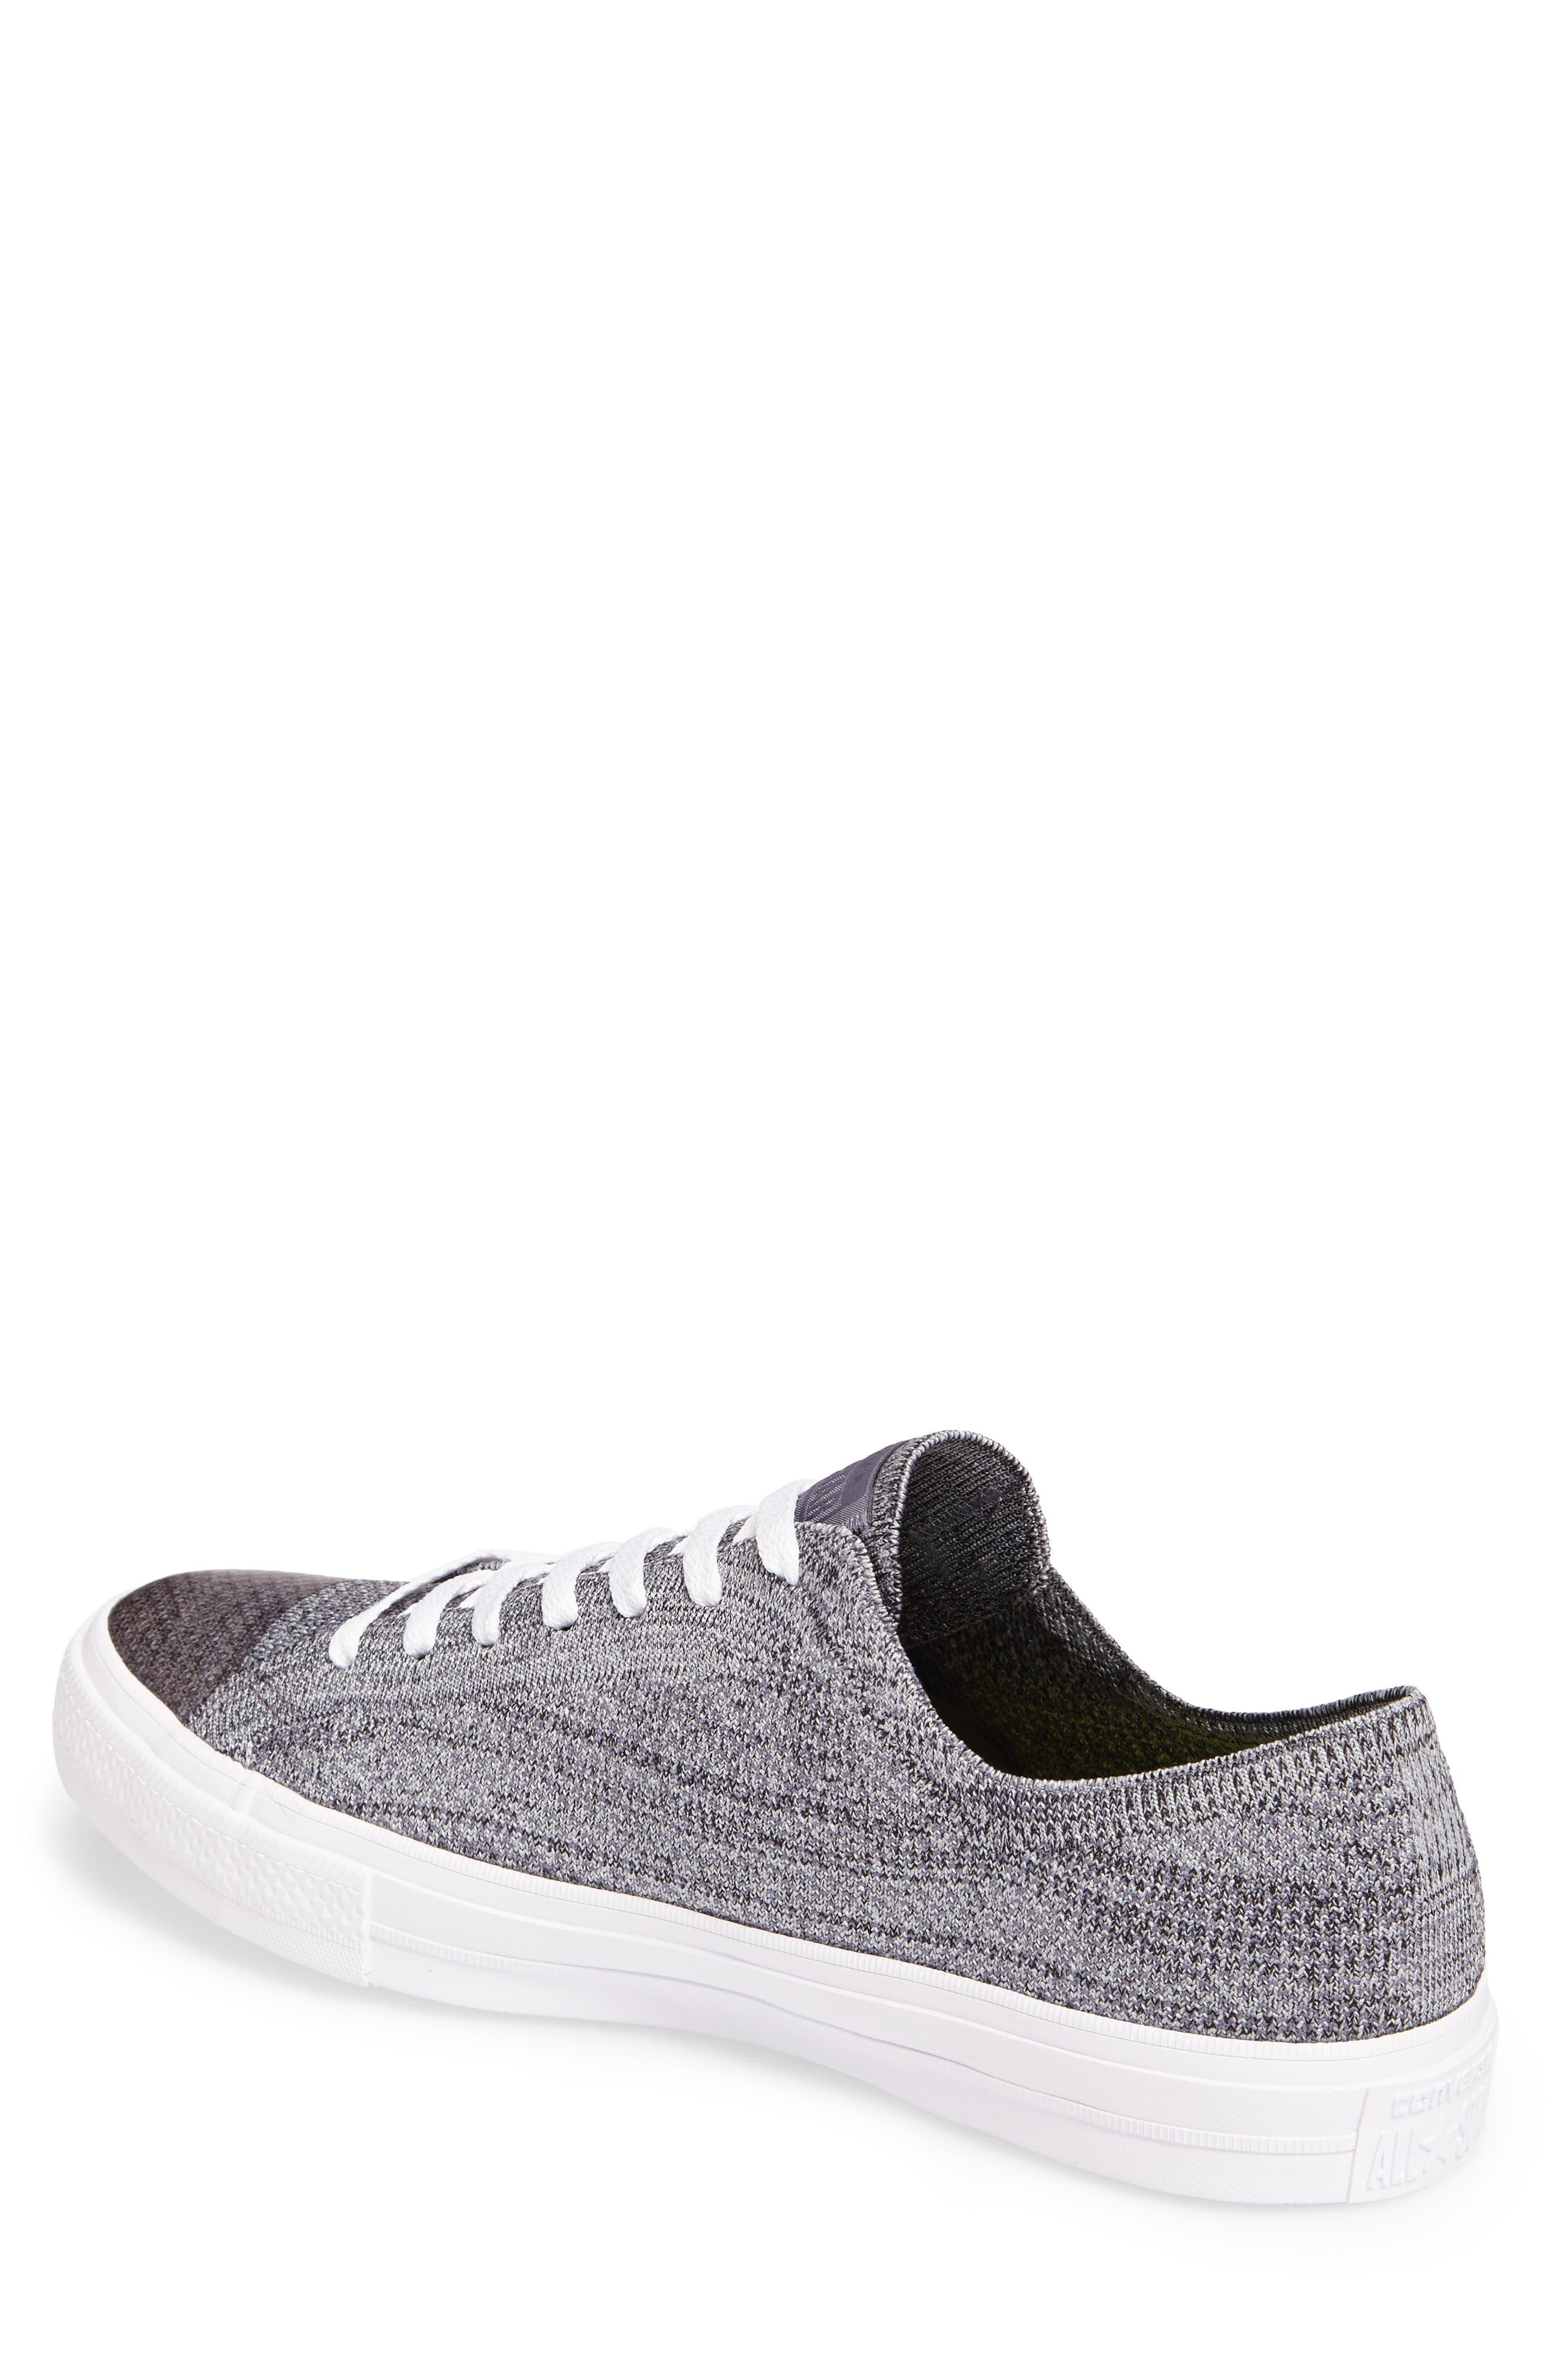 Alternate Image 2  - Converse Chuck Taylor® All Star® Flyknit Sneaker (Men)